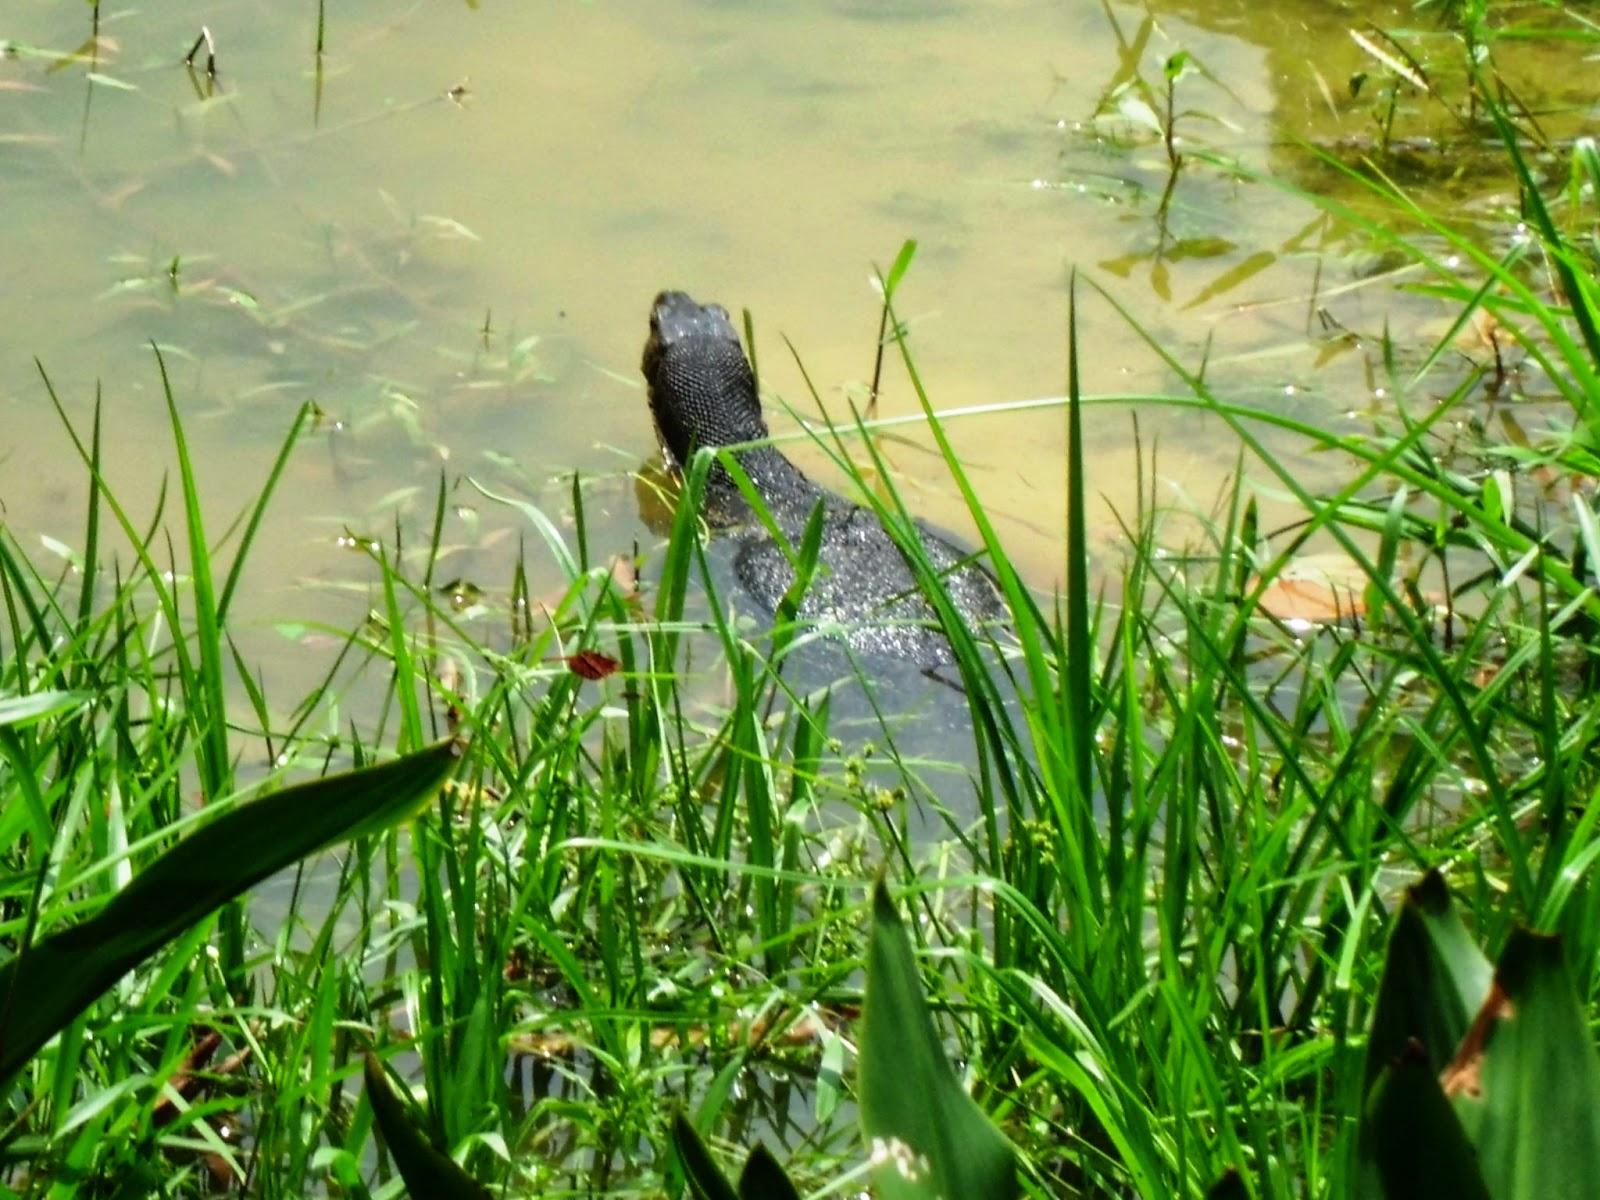 Singapore Botanic Gardens - clouded monitor lizard (Varanus bengalensis)